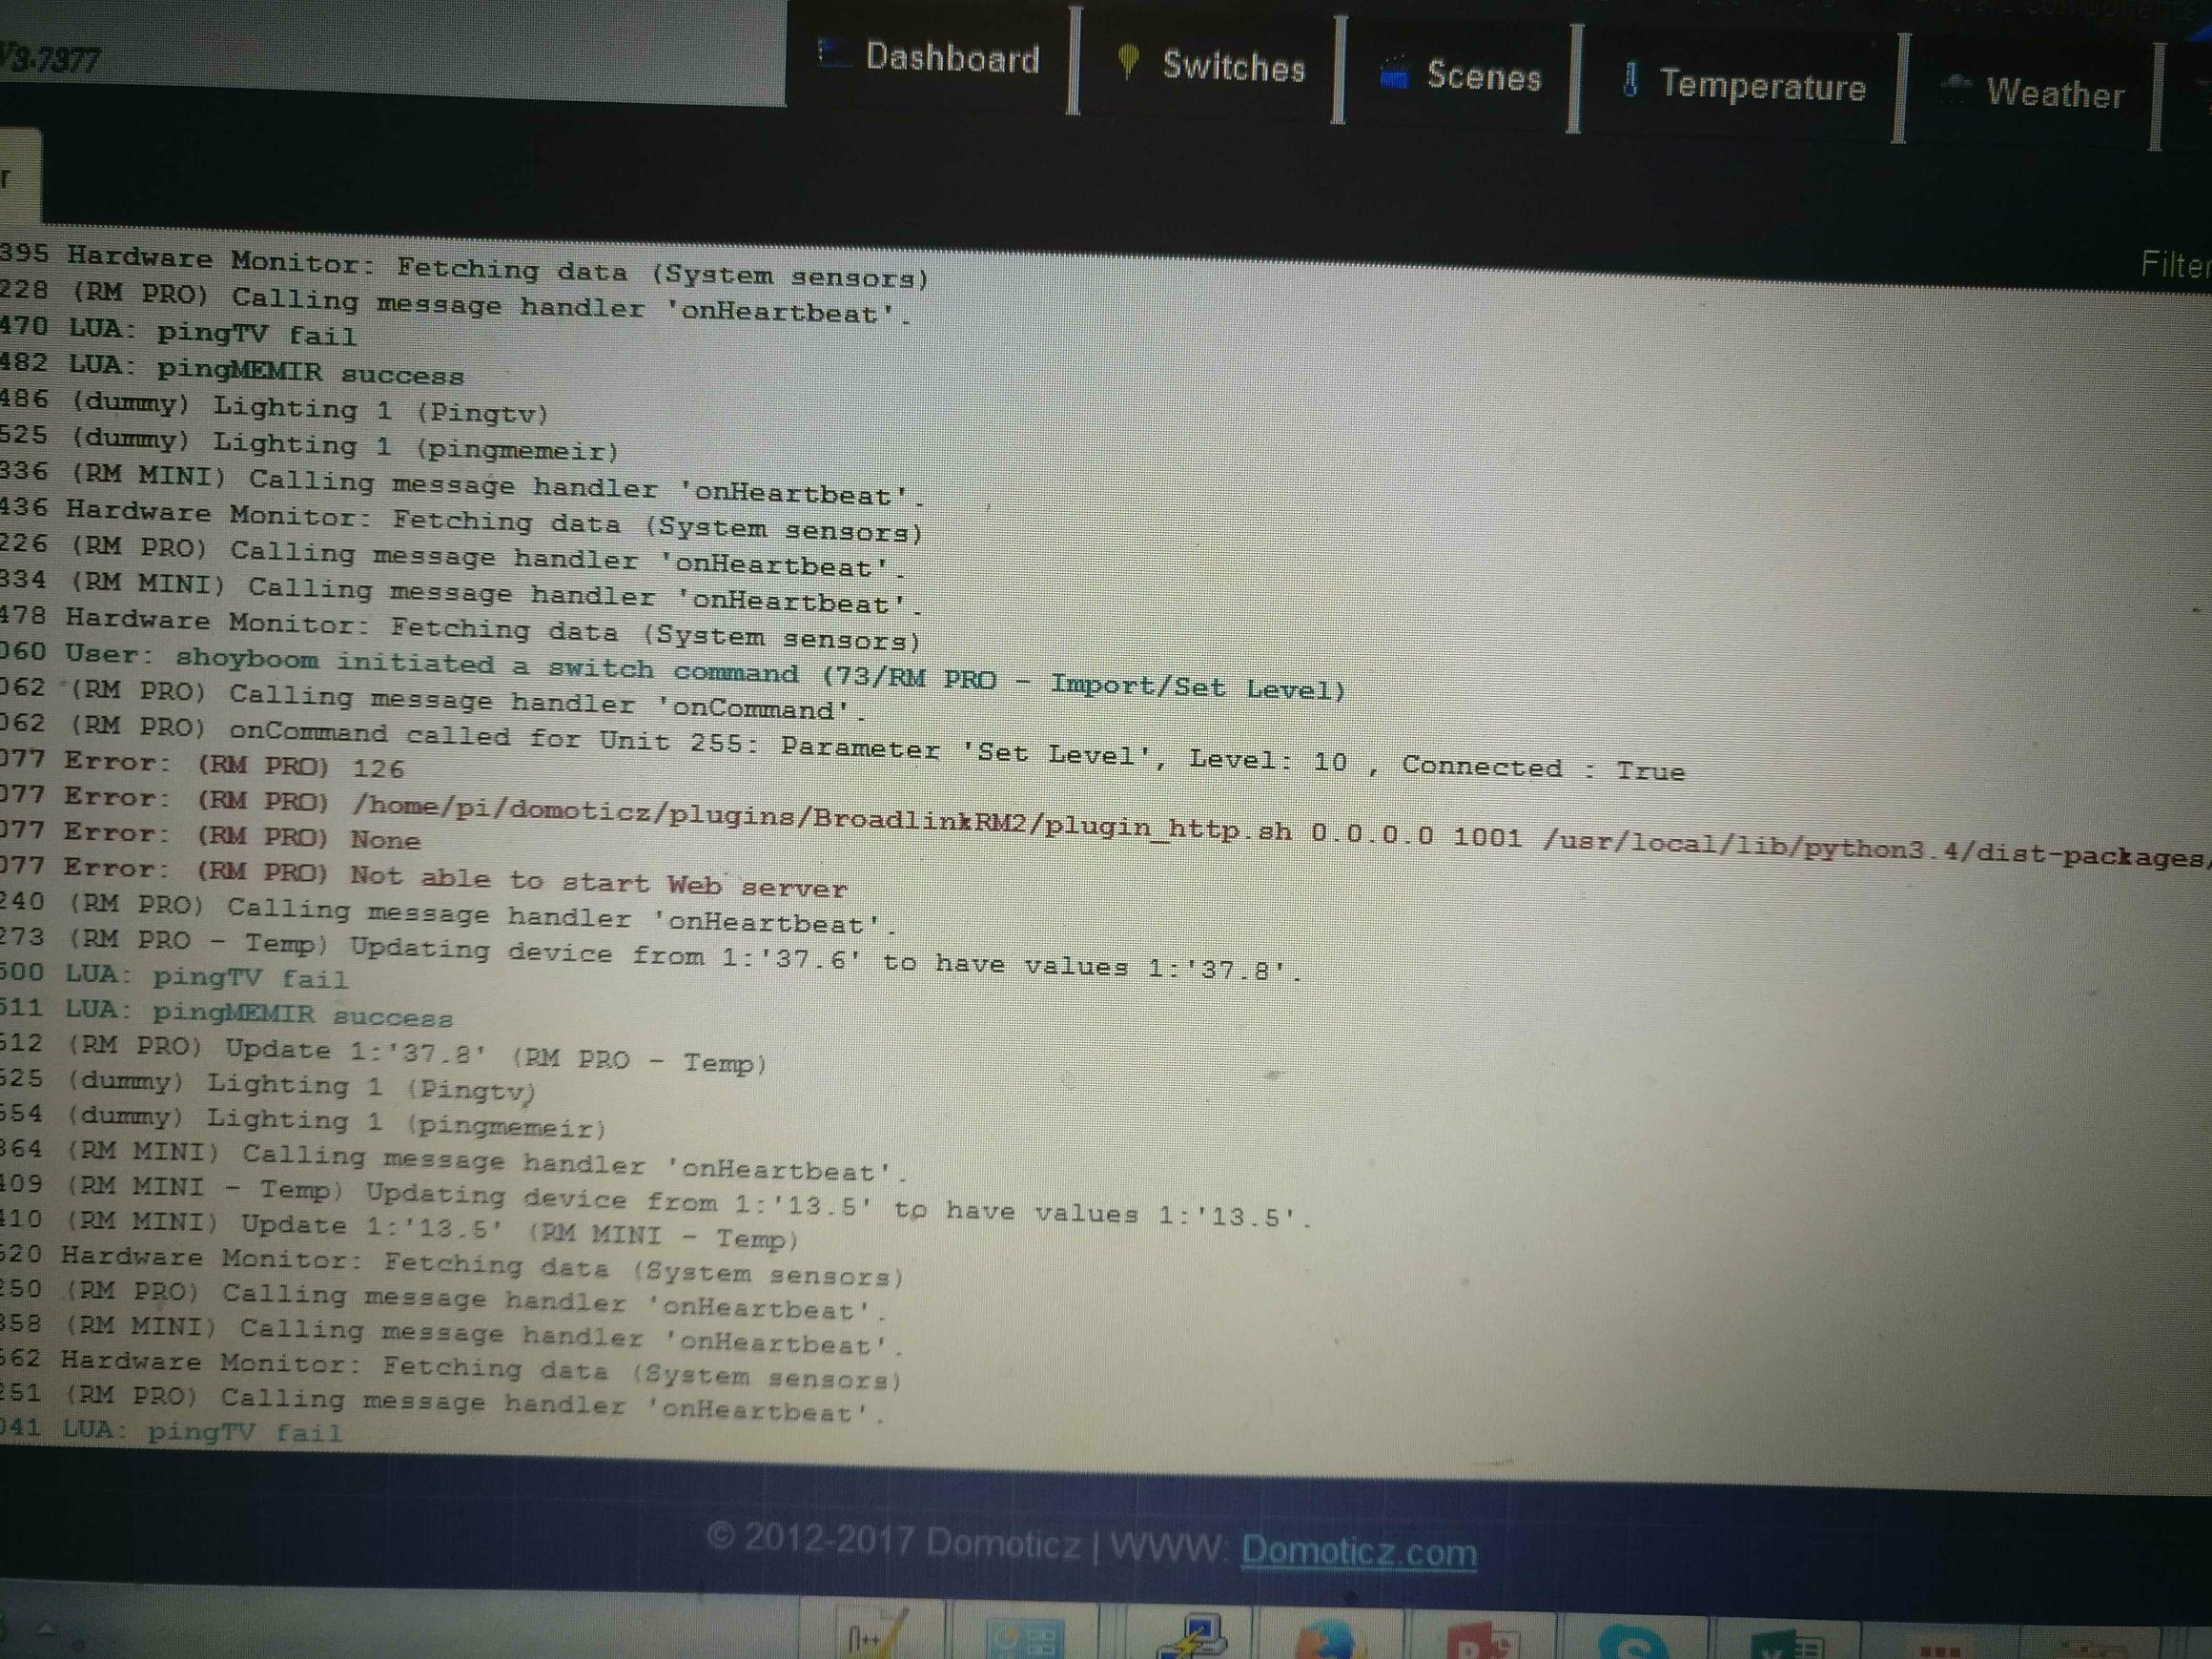 Python Plugin Broadlink Rm2 V2 Domoticz Wiringpi Serial Example Image